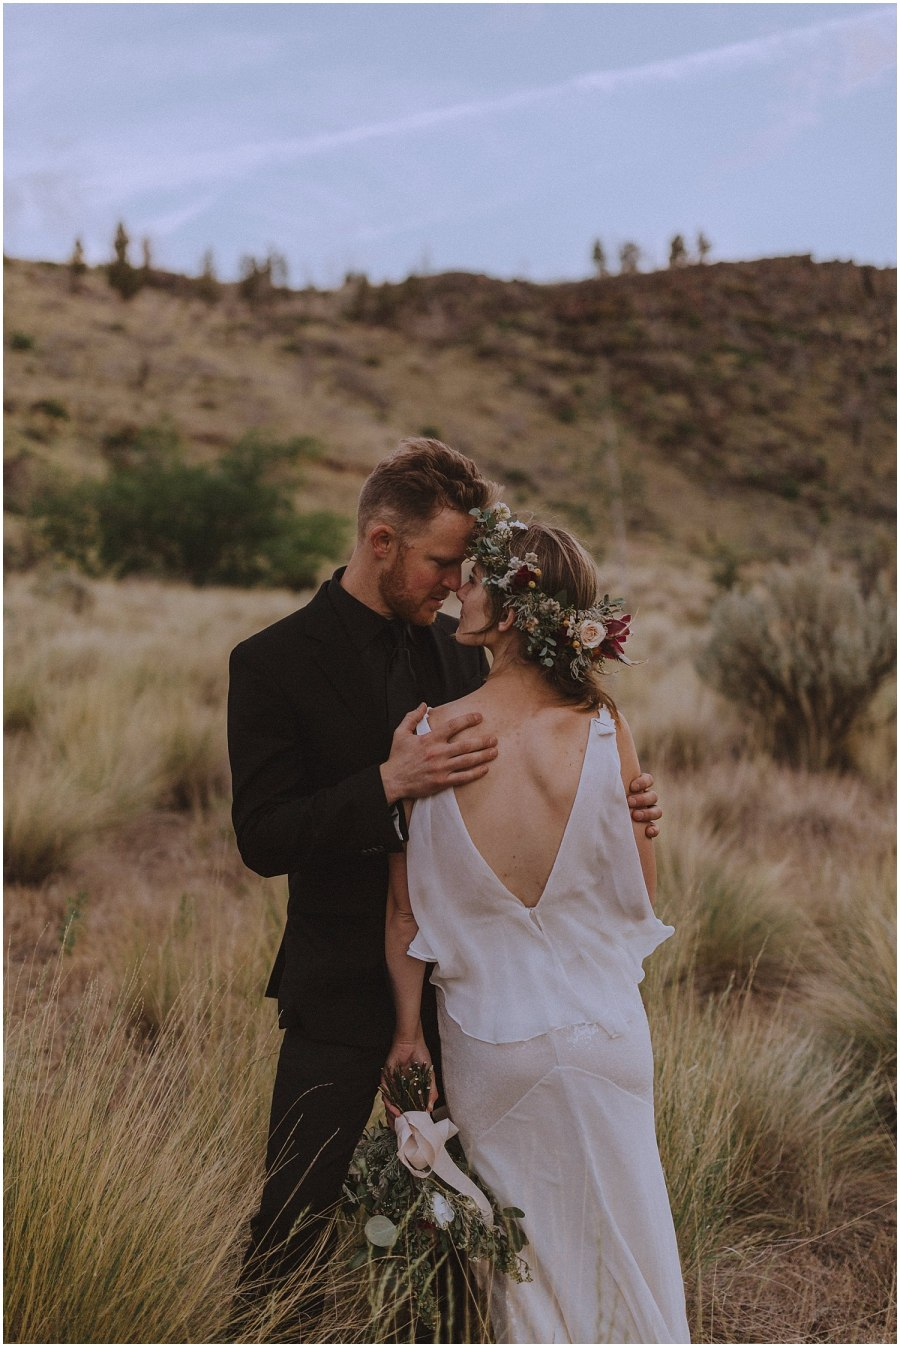 wedding couple cuddling oregon elopement and wedding photographer kyle szeto